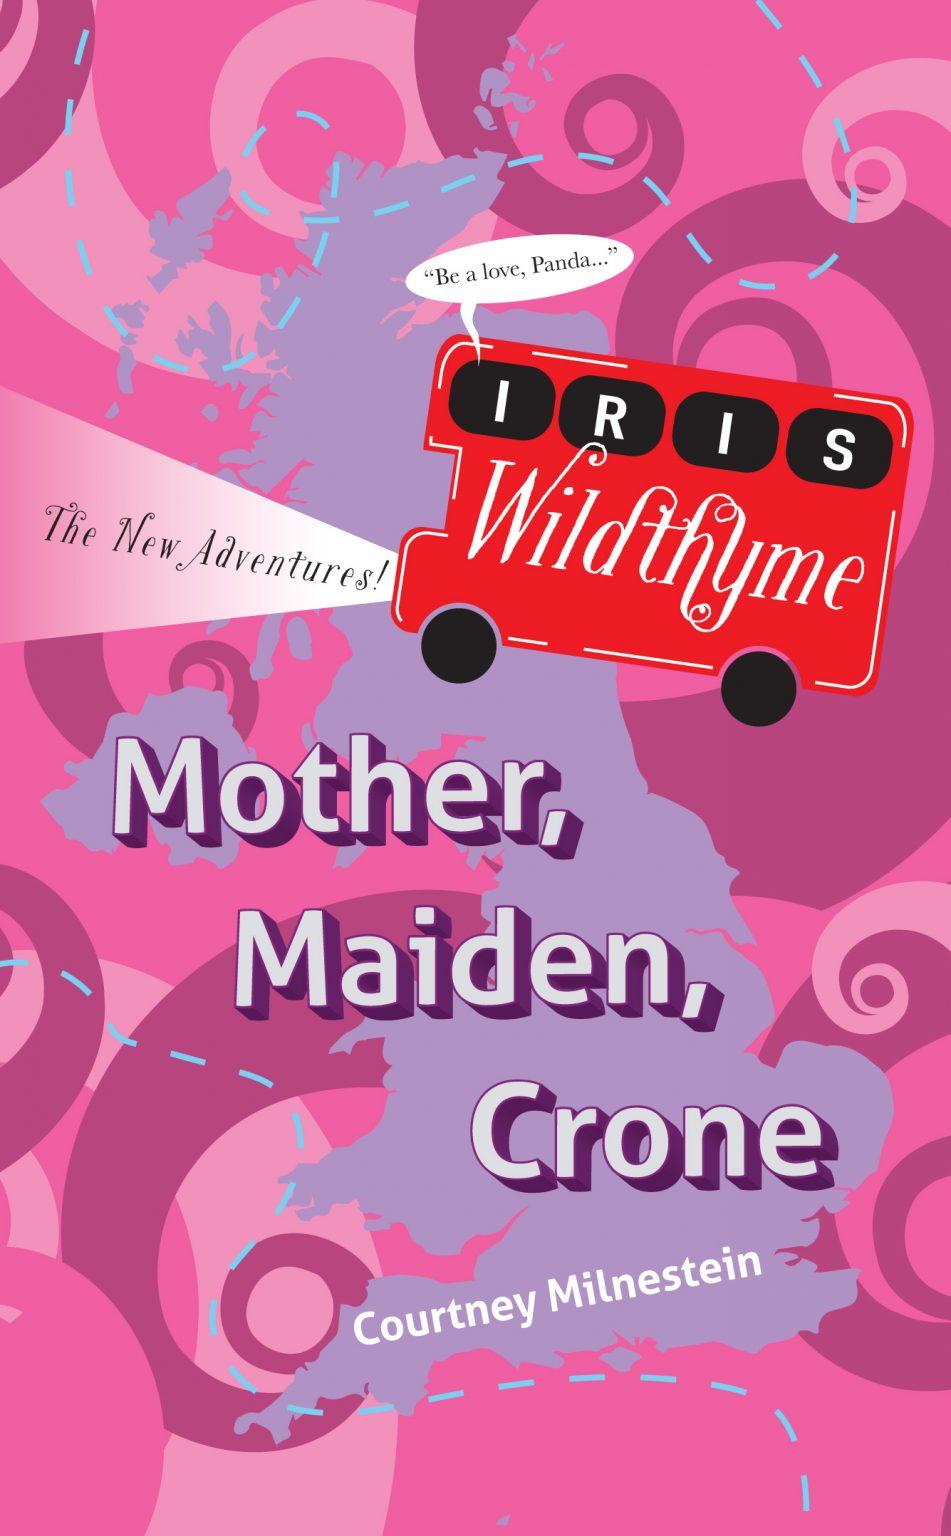 Mother, Maiden, Crone (novel)